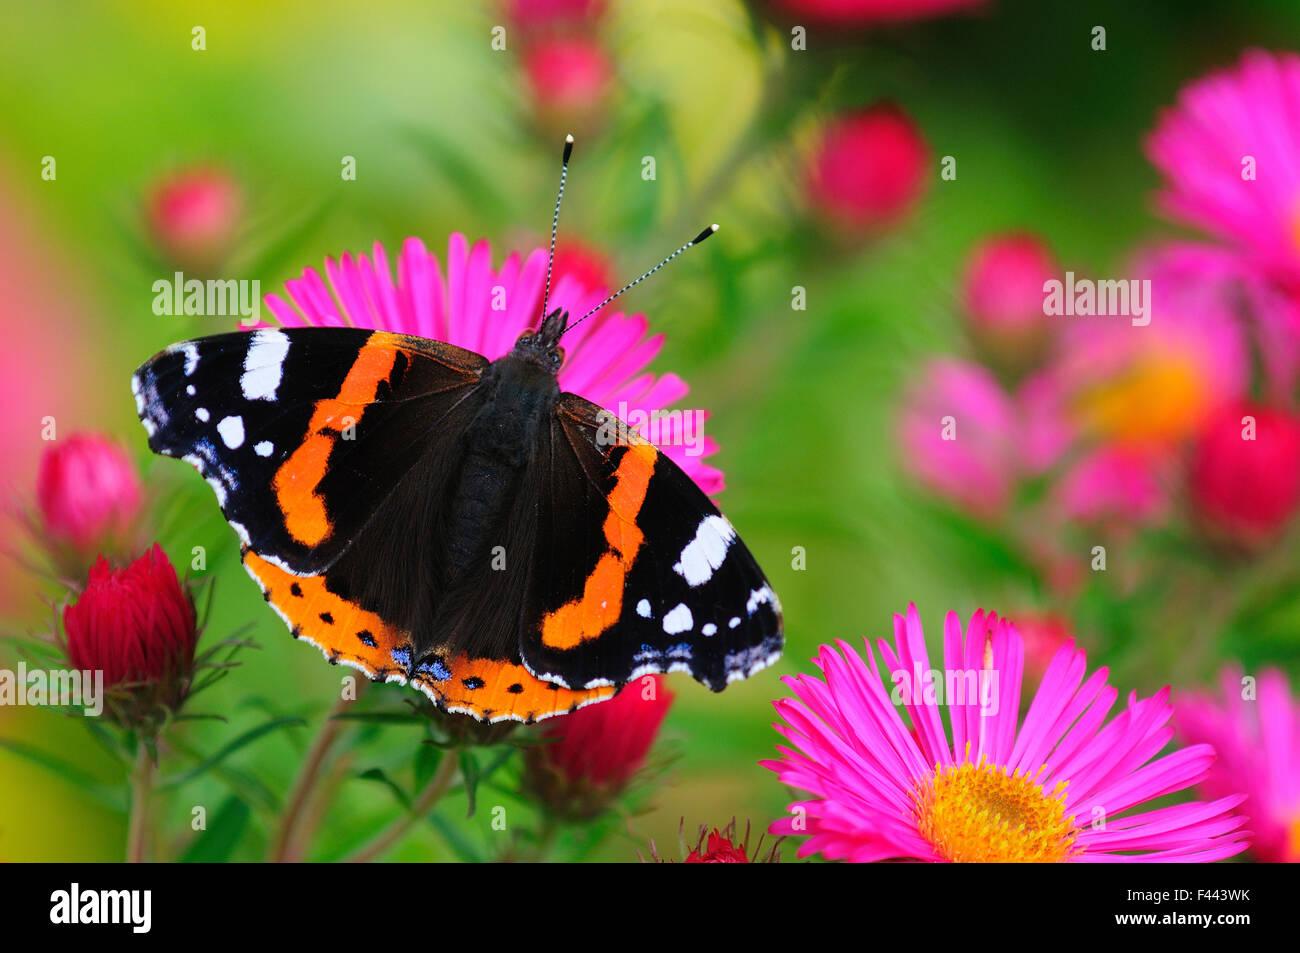 Red Admiral Butterfly (Vanessa atalanta) on Michaelmas daisy flowers. Dorset, UK, October 2012. - Stock Image